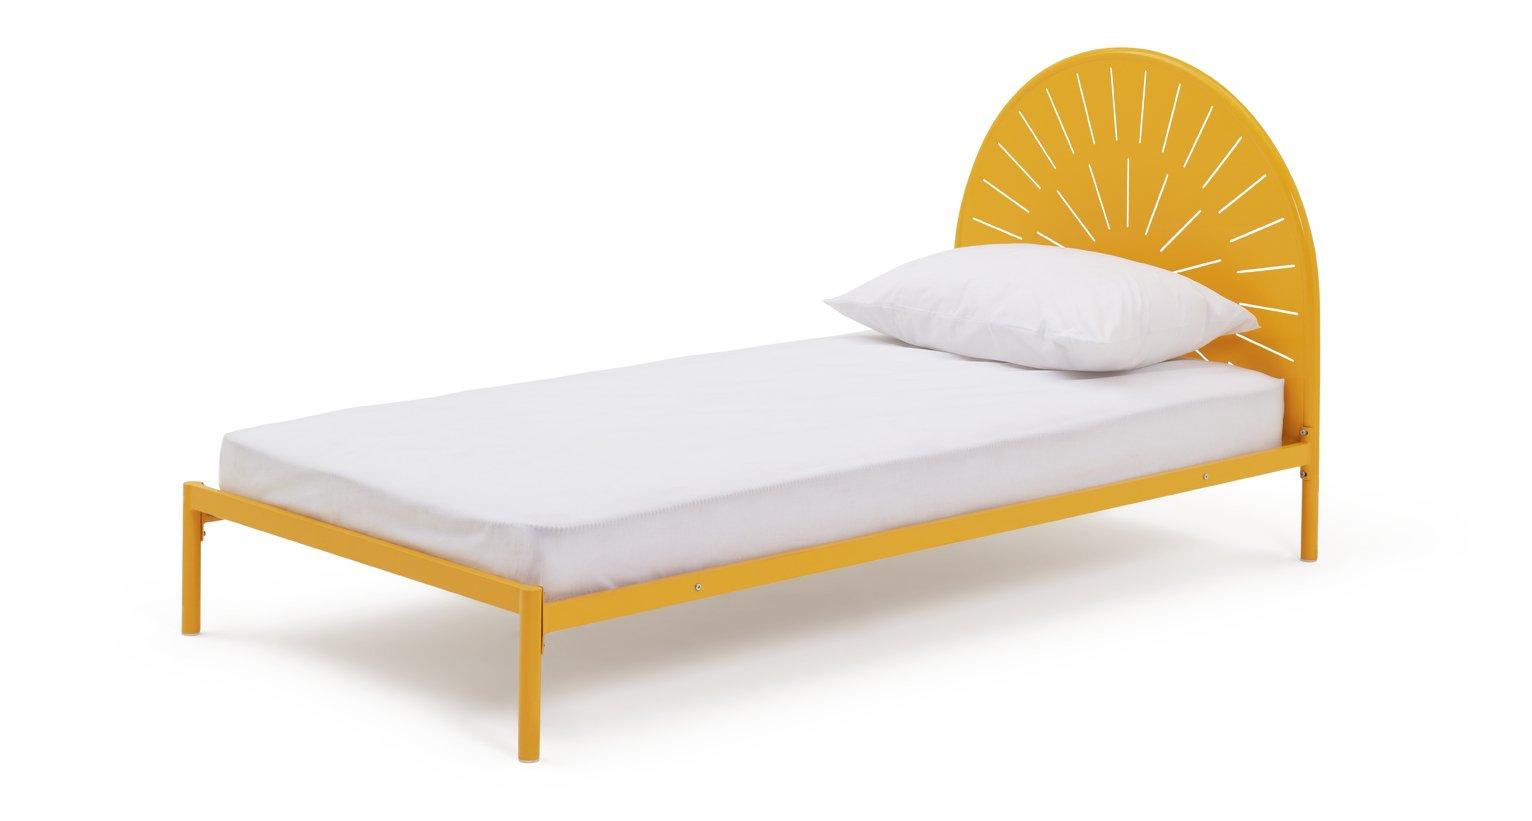 Habitat Sunburst Single Bed Frame and Kids Mattress - Yellow